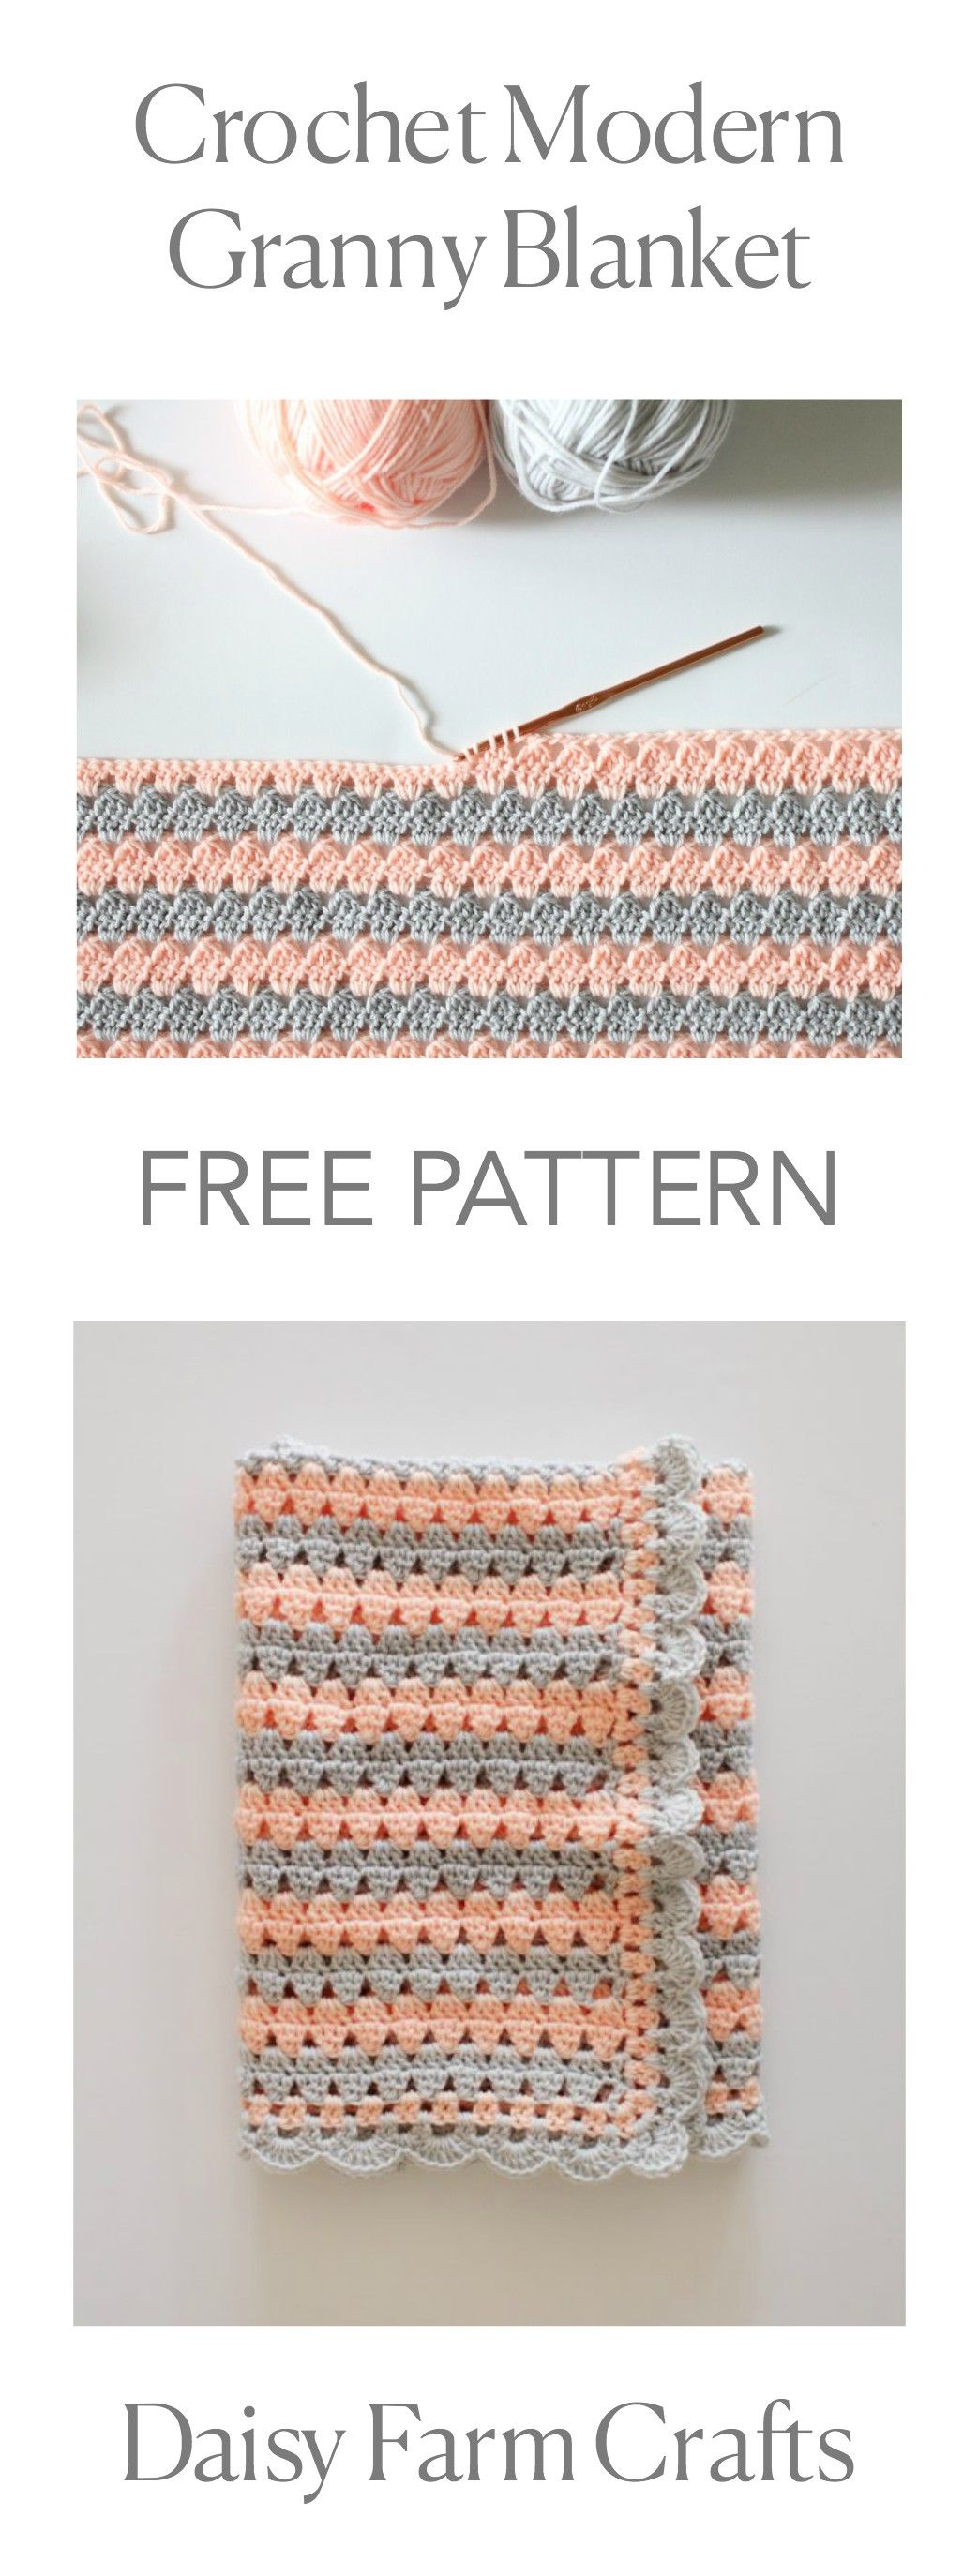 FREE PATTERN - Crochet Modern Granny Blanket | Crochet stitches ...